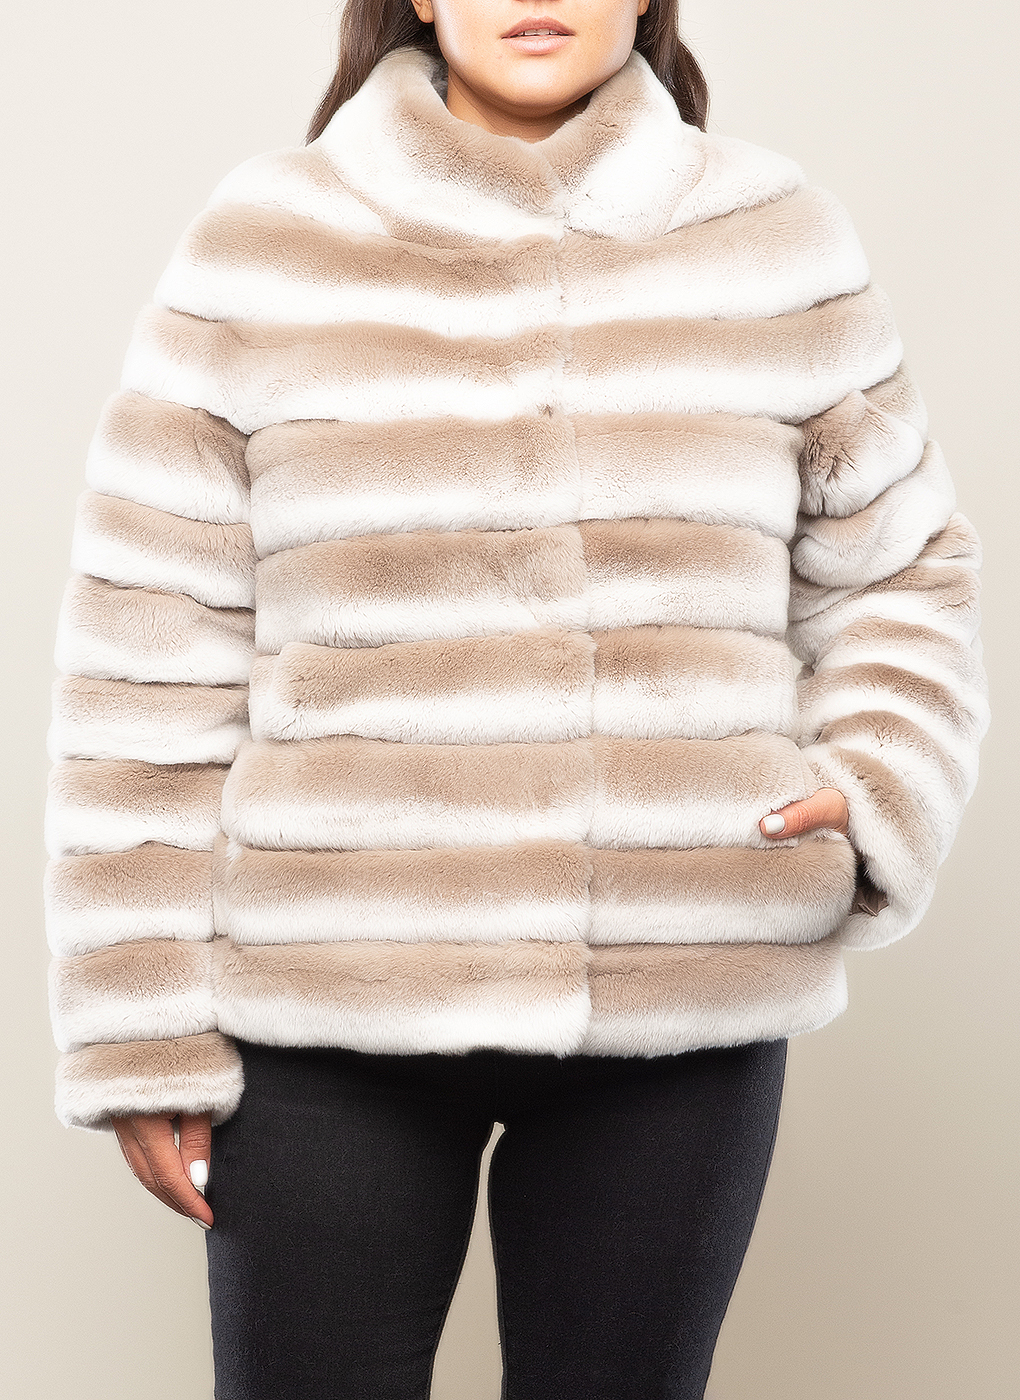 Куртка из кролика рекс Джульетта 1 04 двусторонняя, Scandza фото